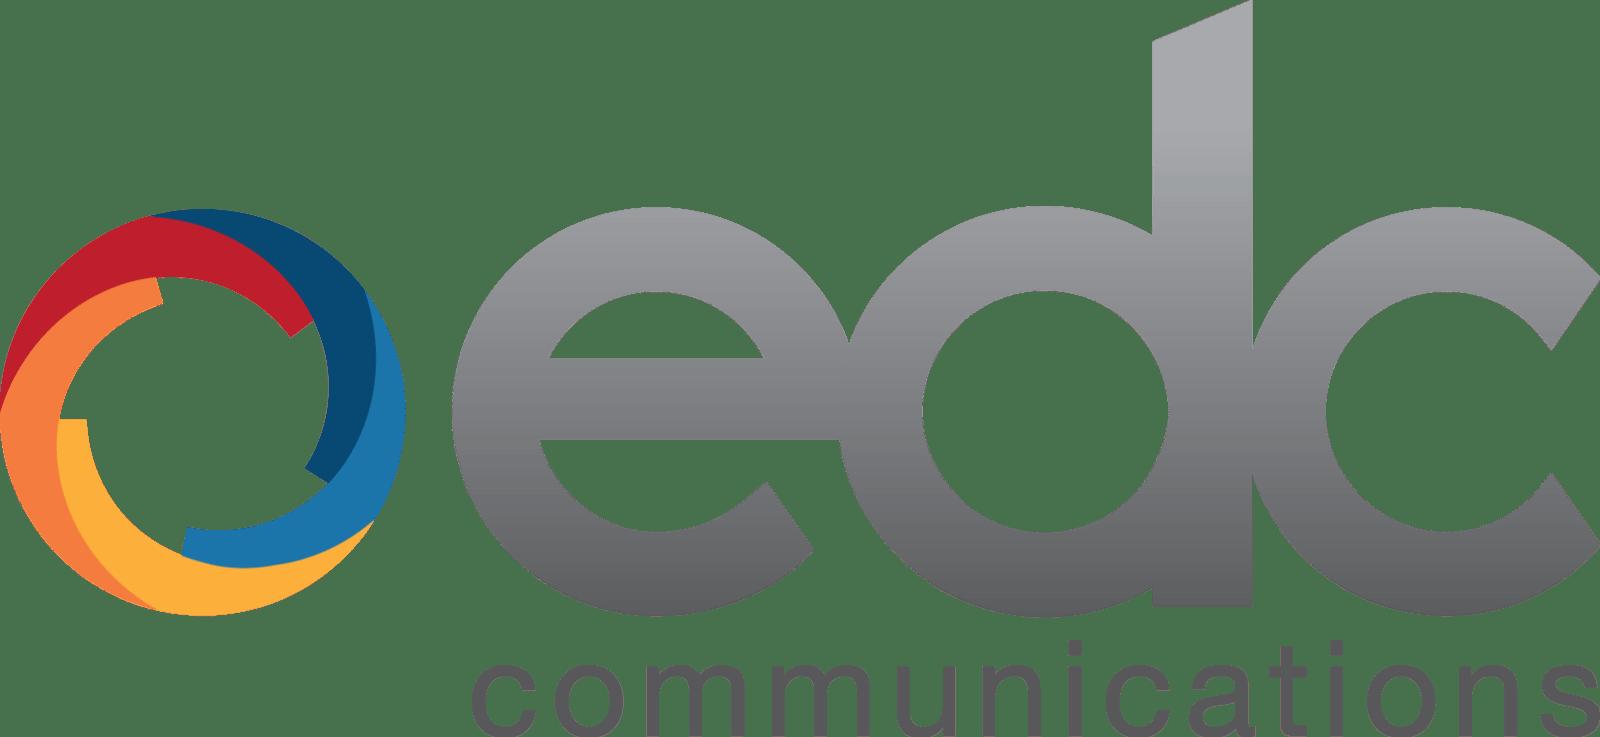 EDC Communications